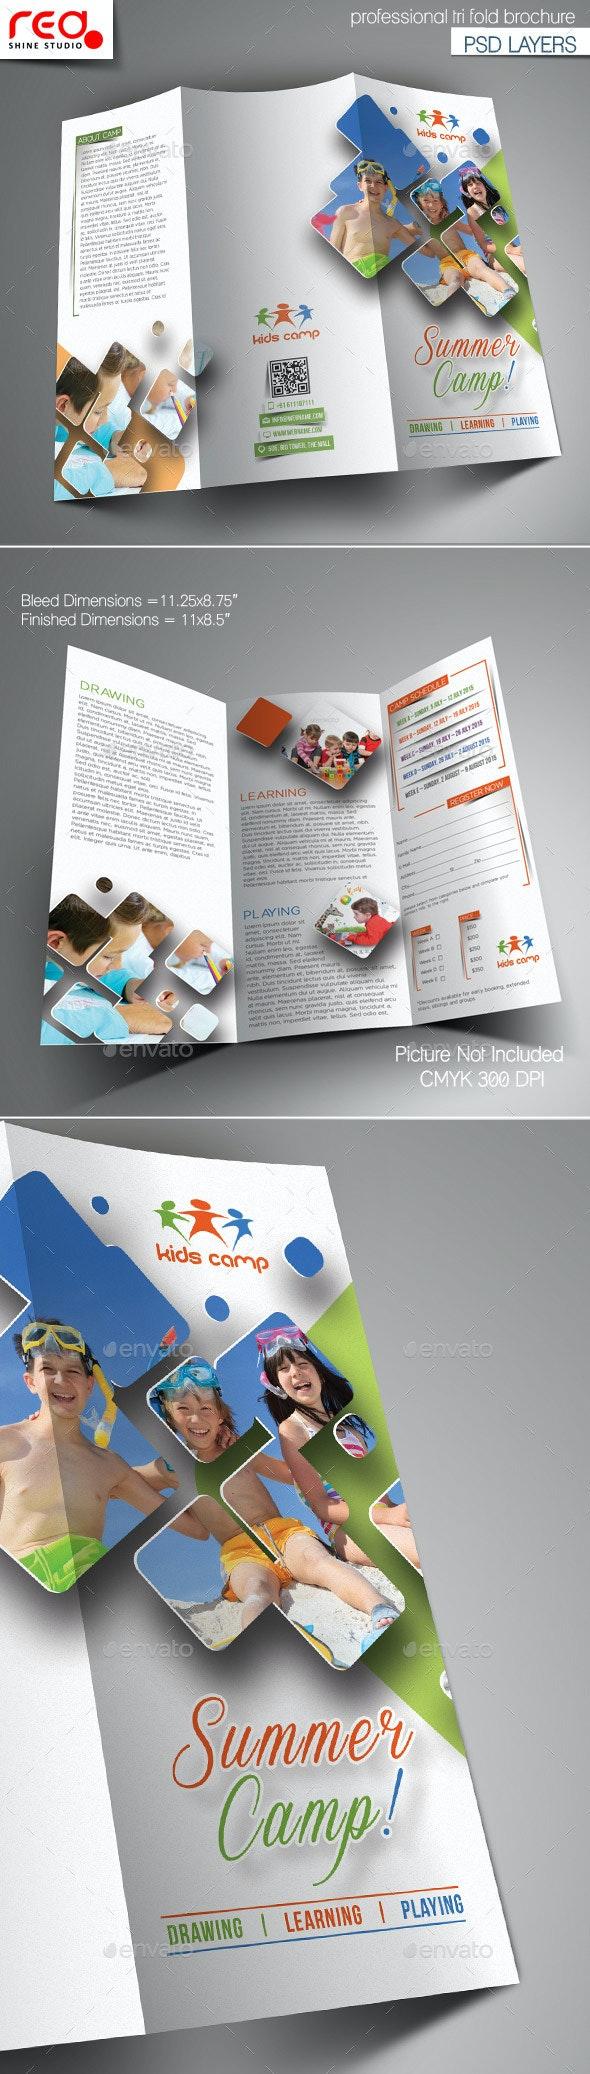 Summer Camp Trifold Brochure Template - 1 - Brochures Print Templates